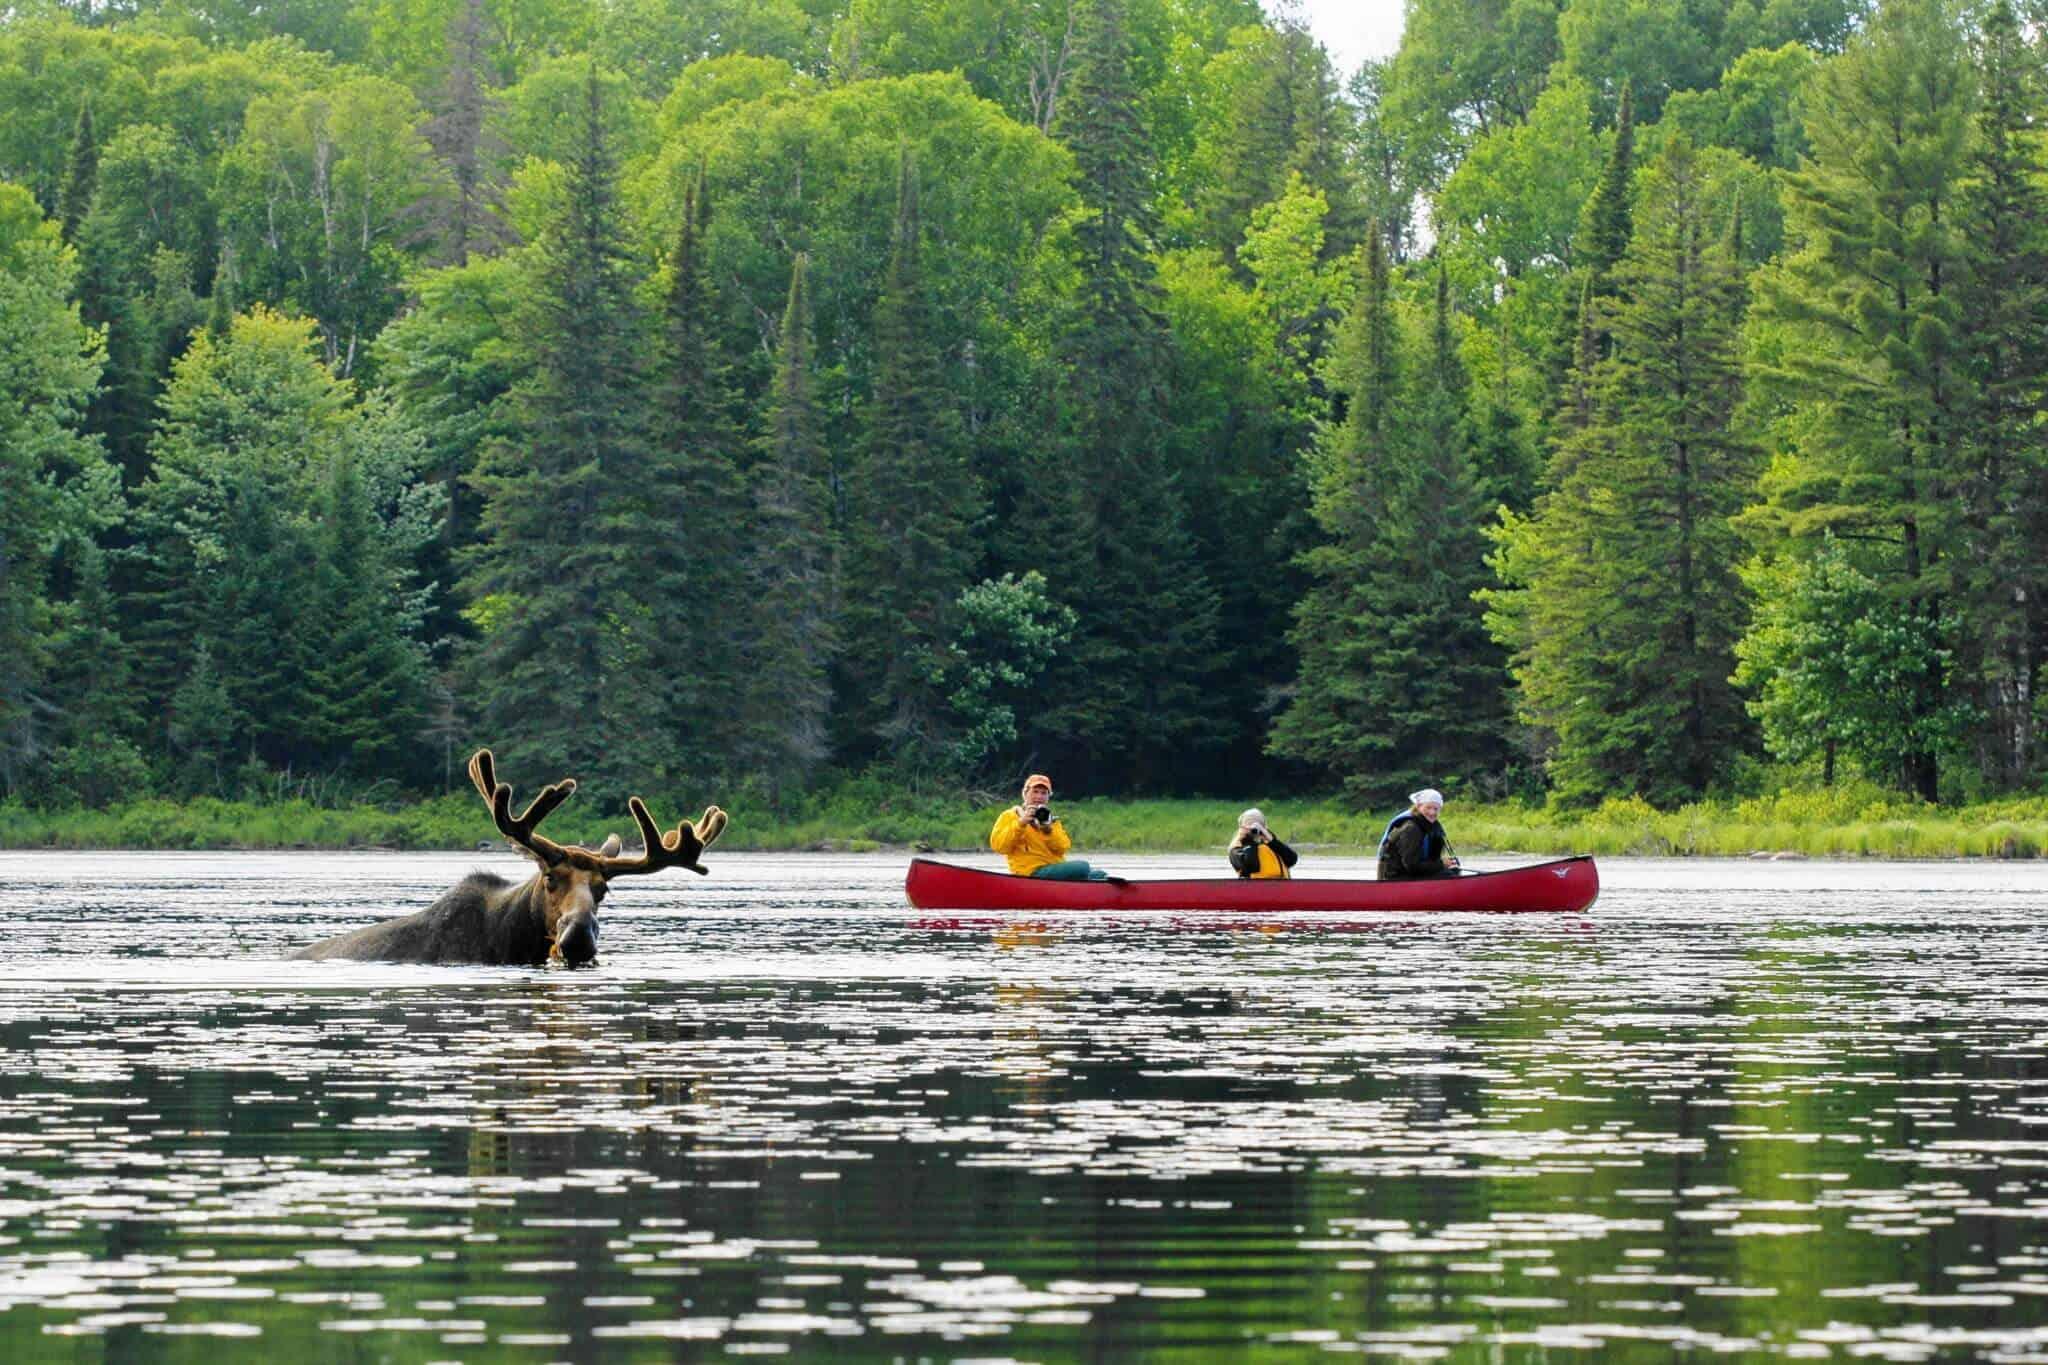 Day Trip Up To Island Lake Lodge